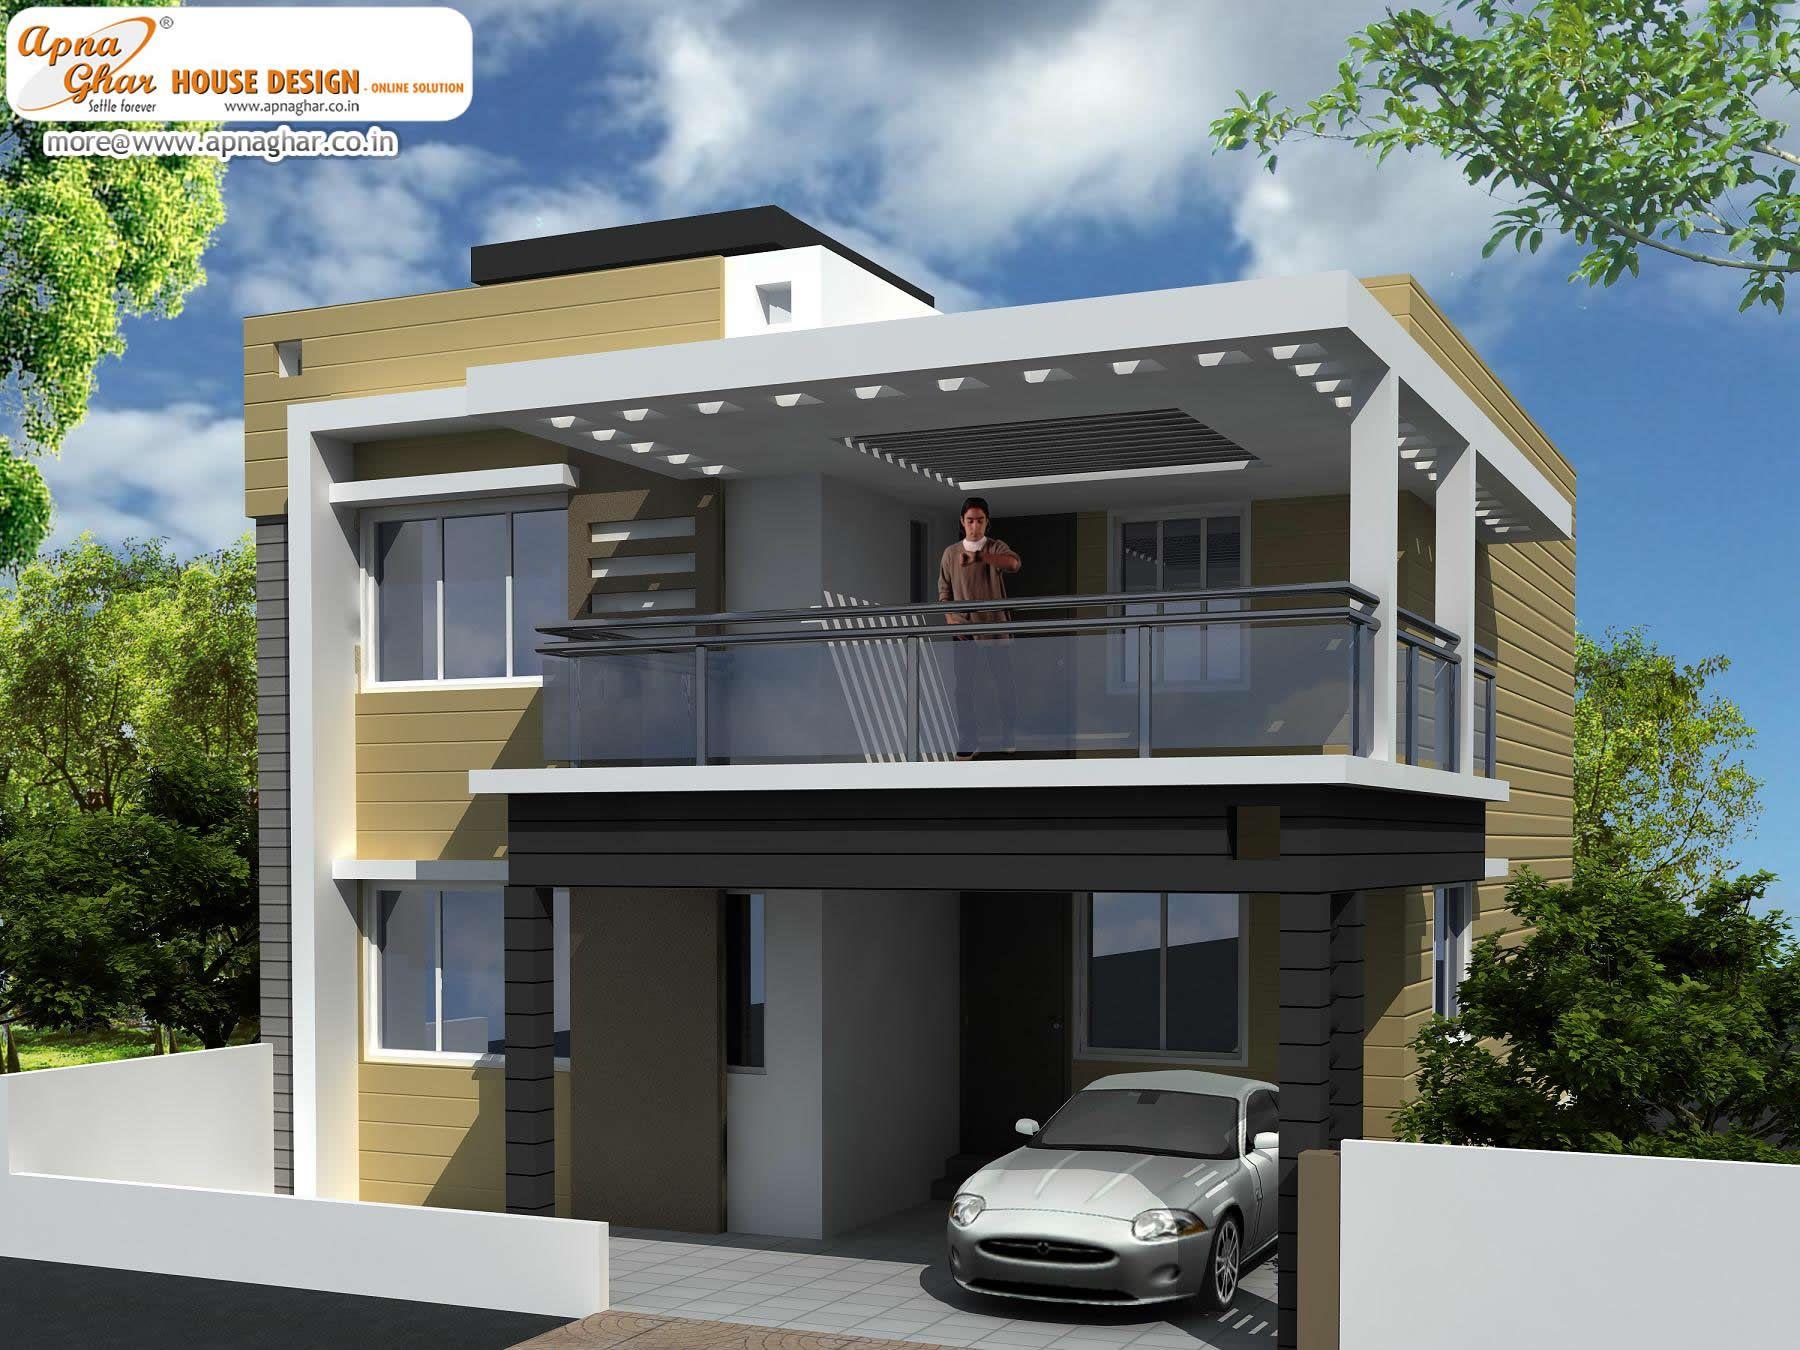 Build your own virtual house driverlayer search engine - Small duplex interior design ideas ...